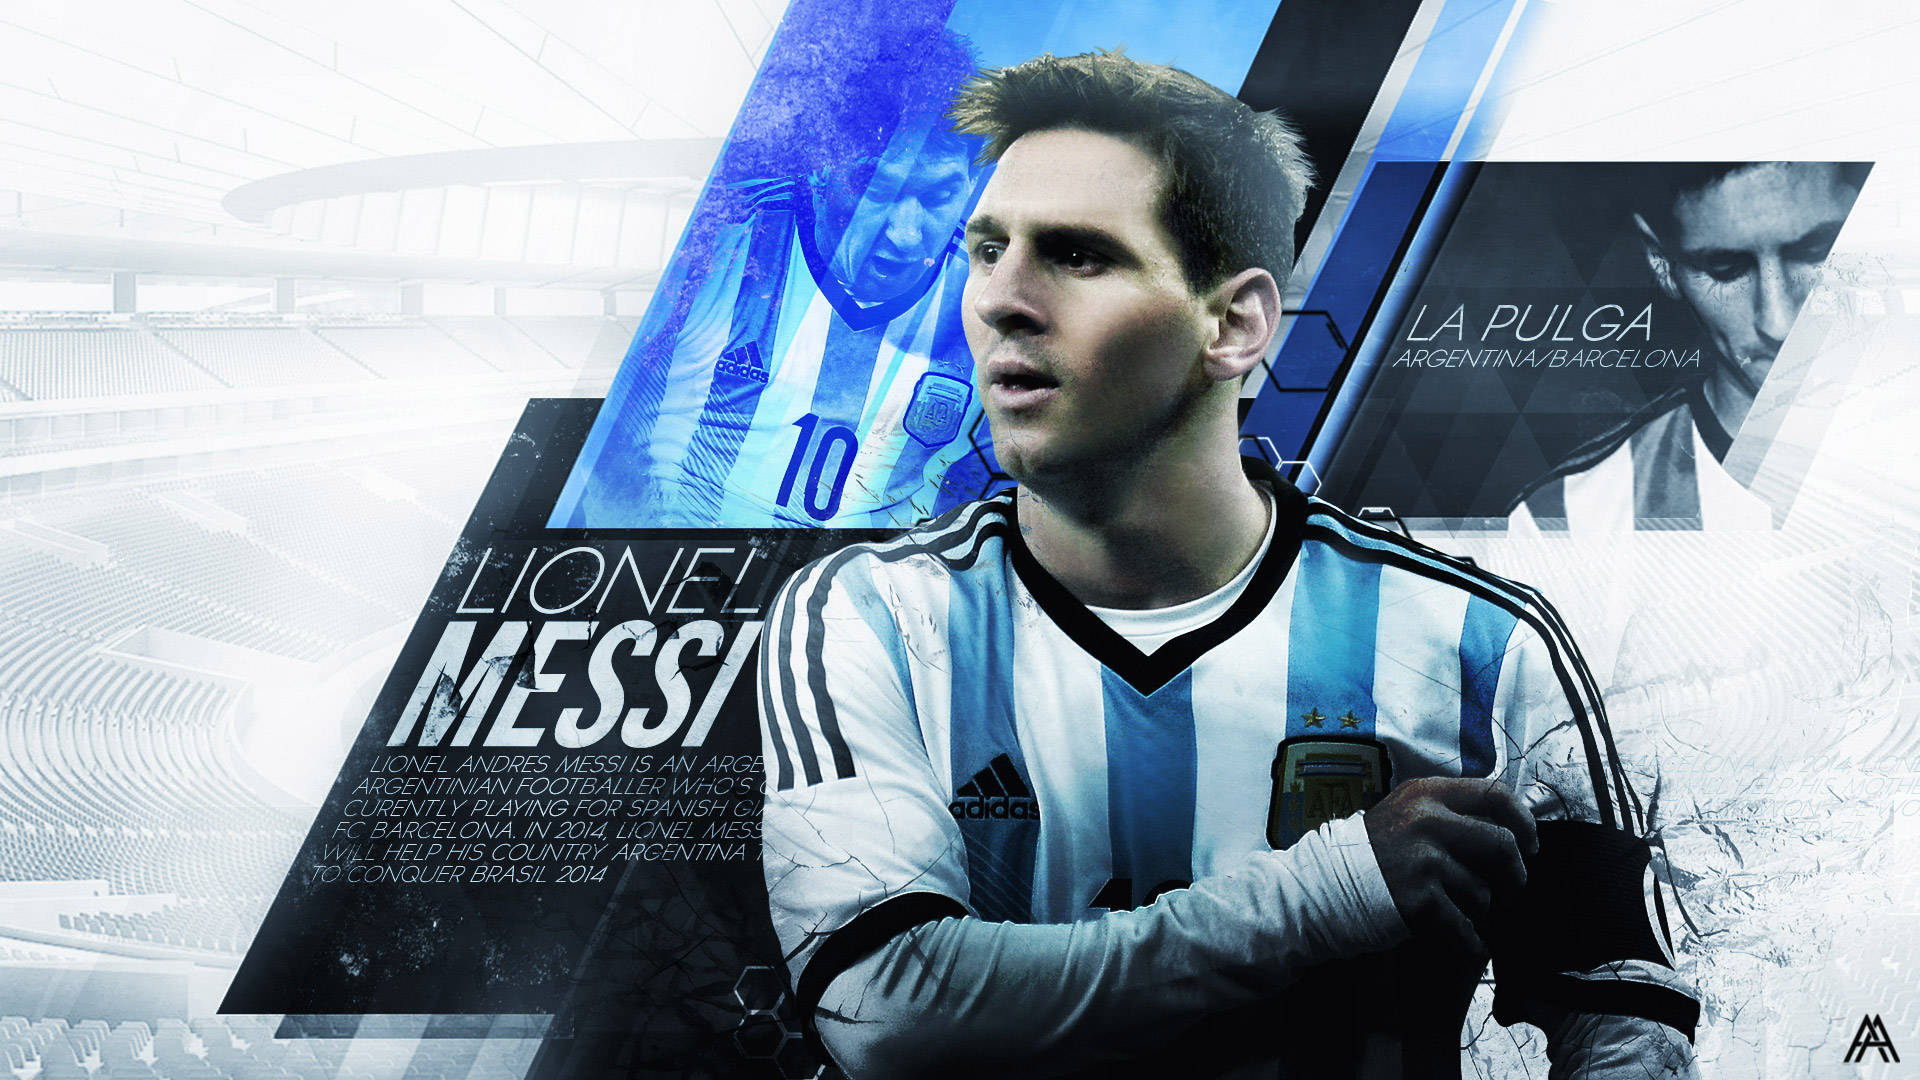 Messi Desktop Background Wallpapers Backgrounds Images Art Photos 1920x1080